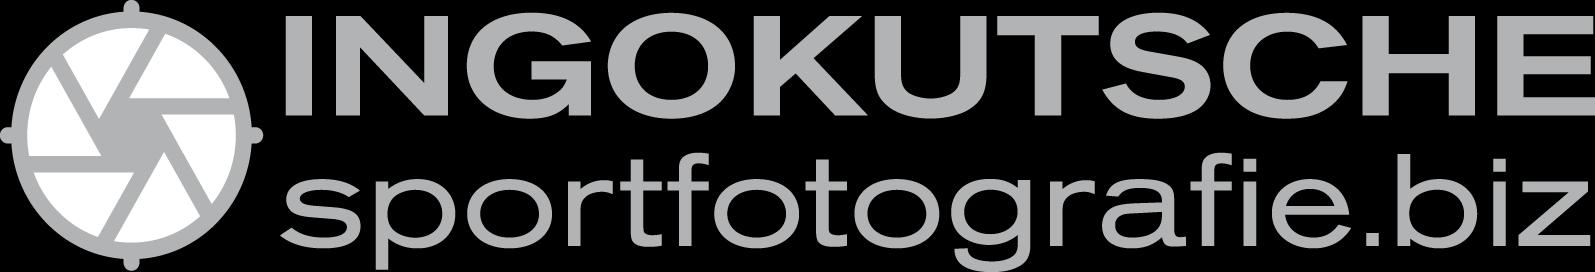 Ingo Kutsche - Sportfotografie.biz